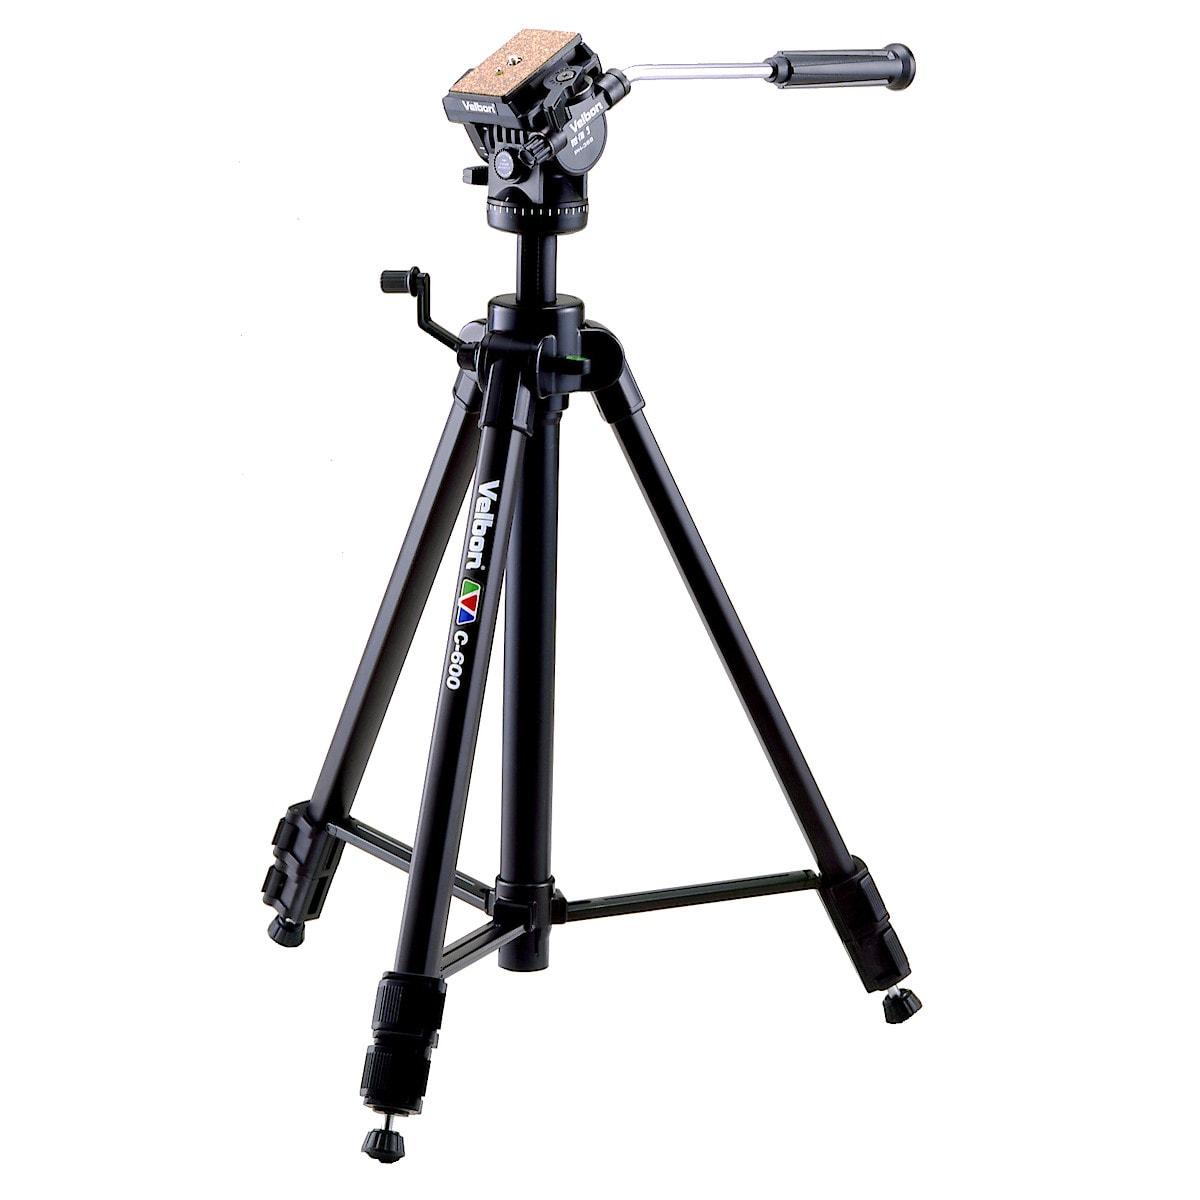 Videokamerajalusta Velbon C-600